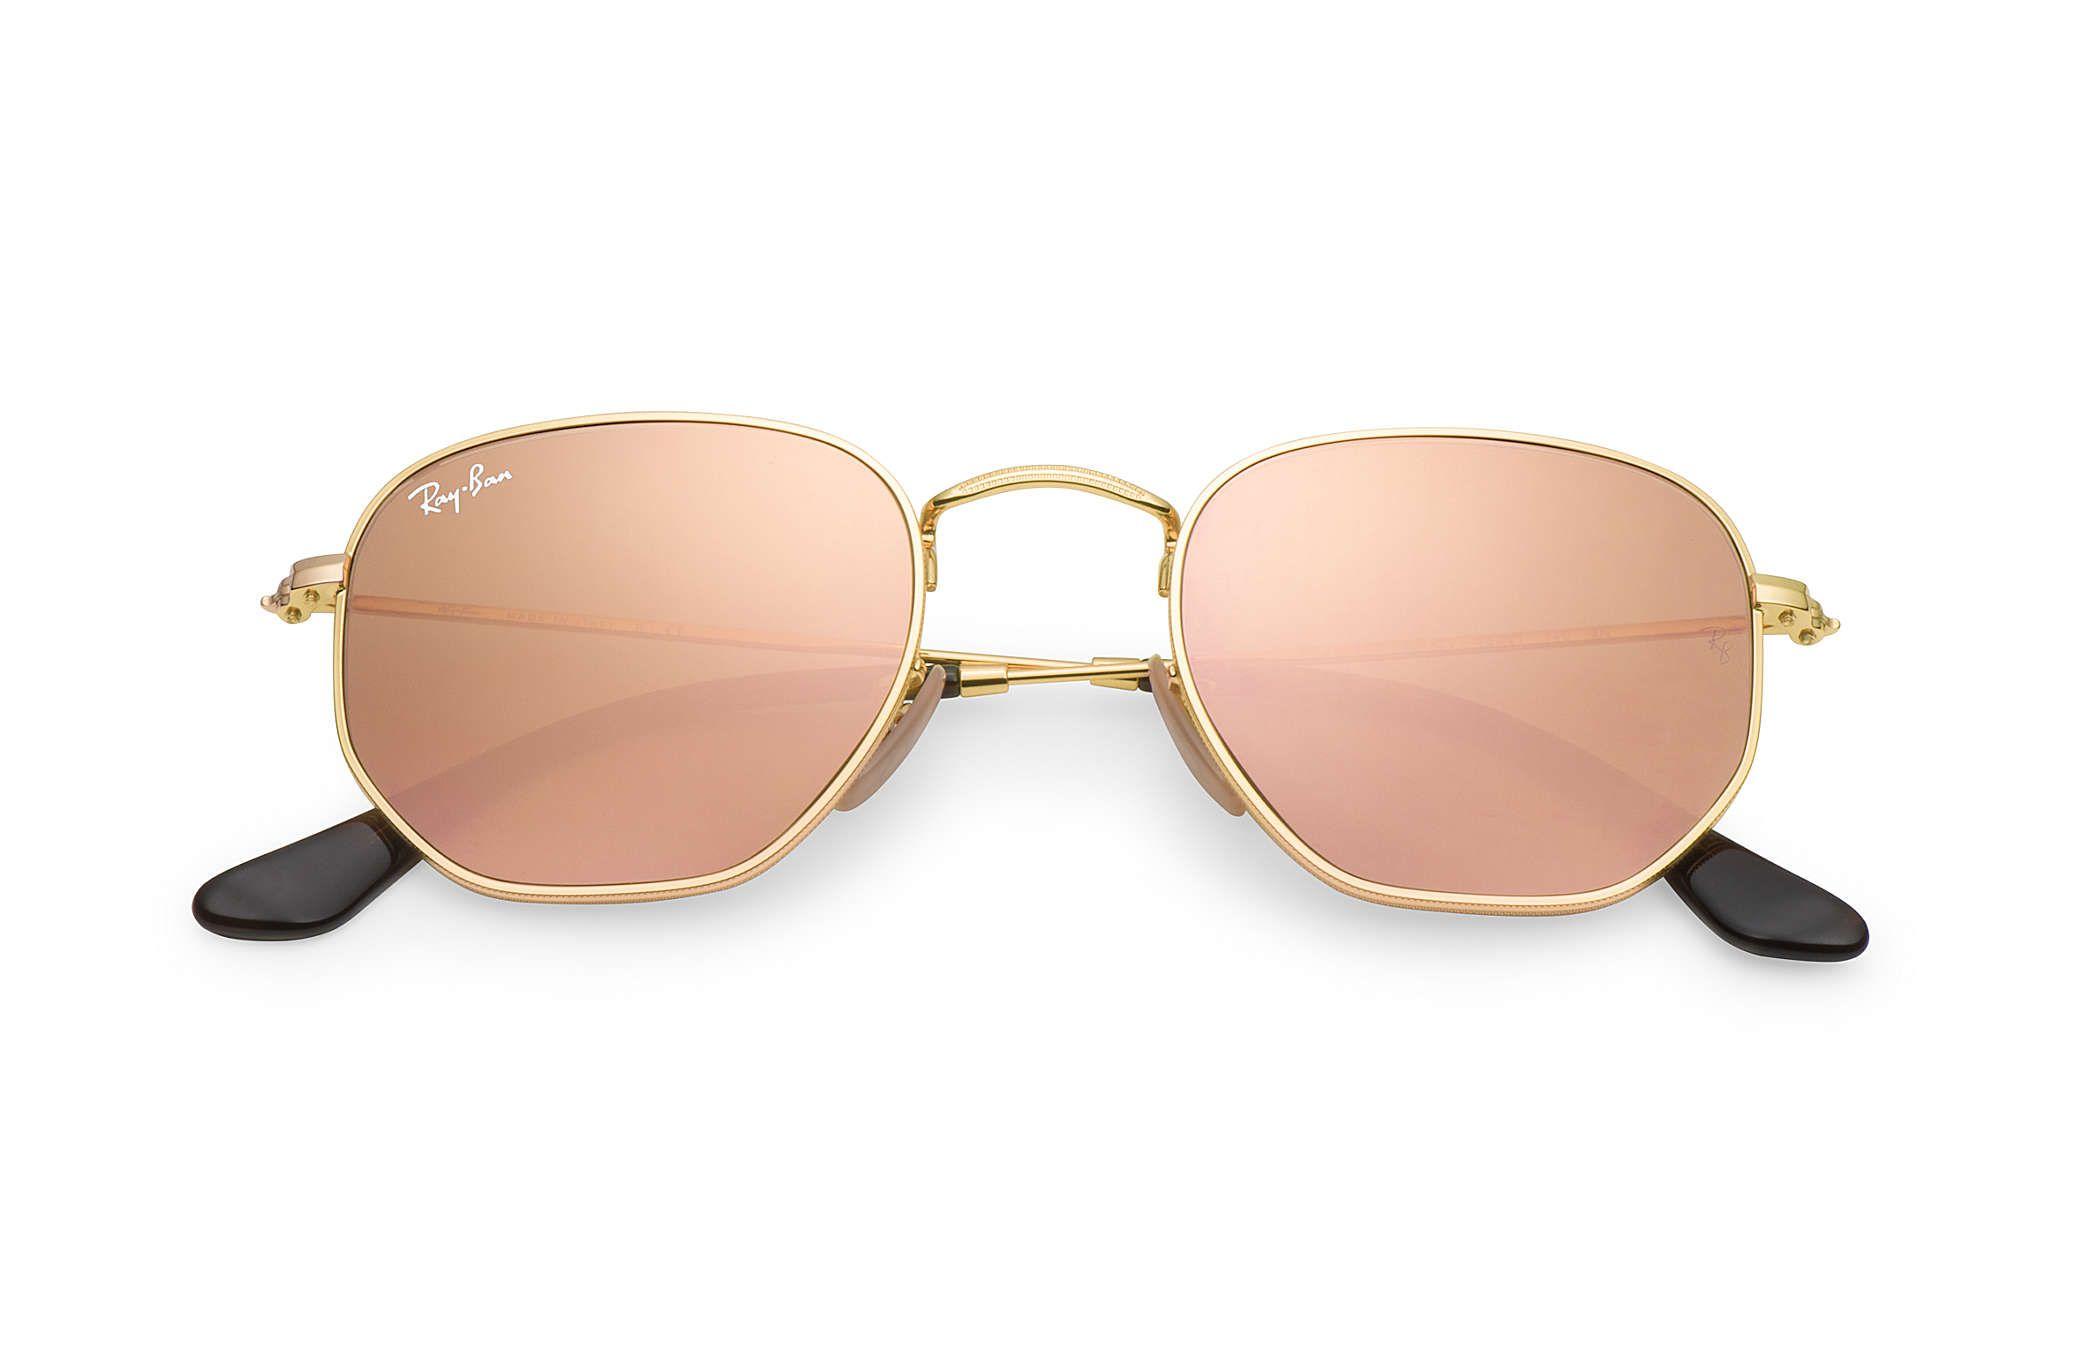 Luxottica S.p.A   Wishlist   Sunglasses, Ray bans, Lenses 1e8c2344ac5d